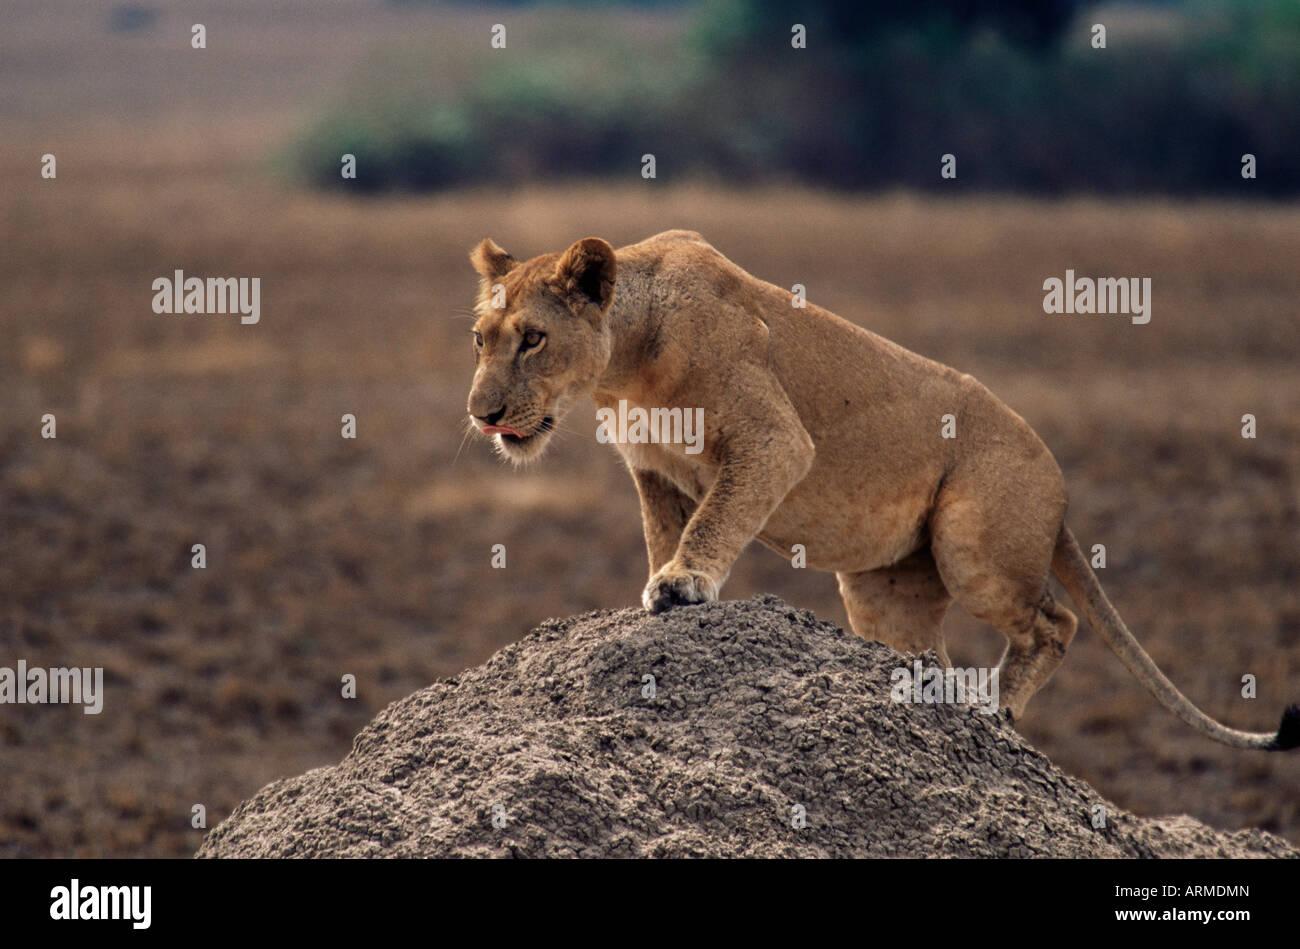 Lion (Panthera leo) on termite mound, Queen Elizabeth National Park, Uganda, East Africa, Africa - Stock Image